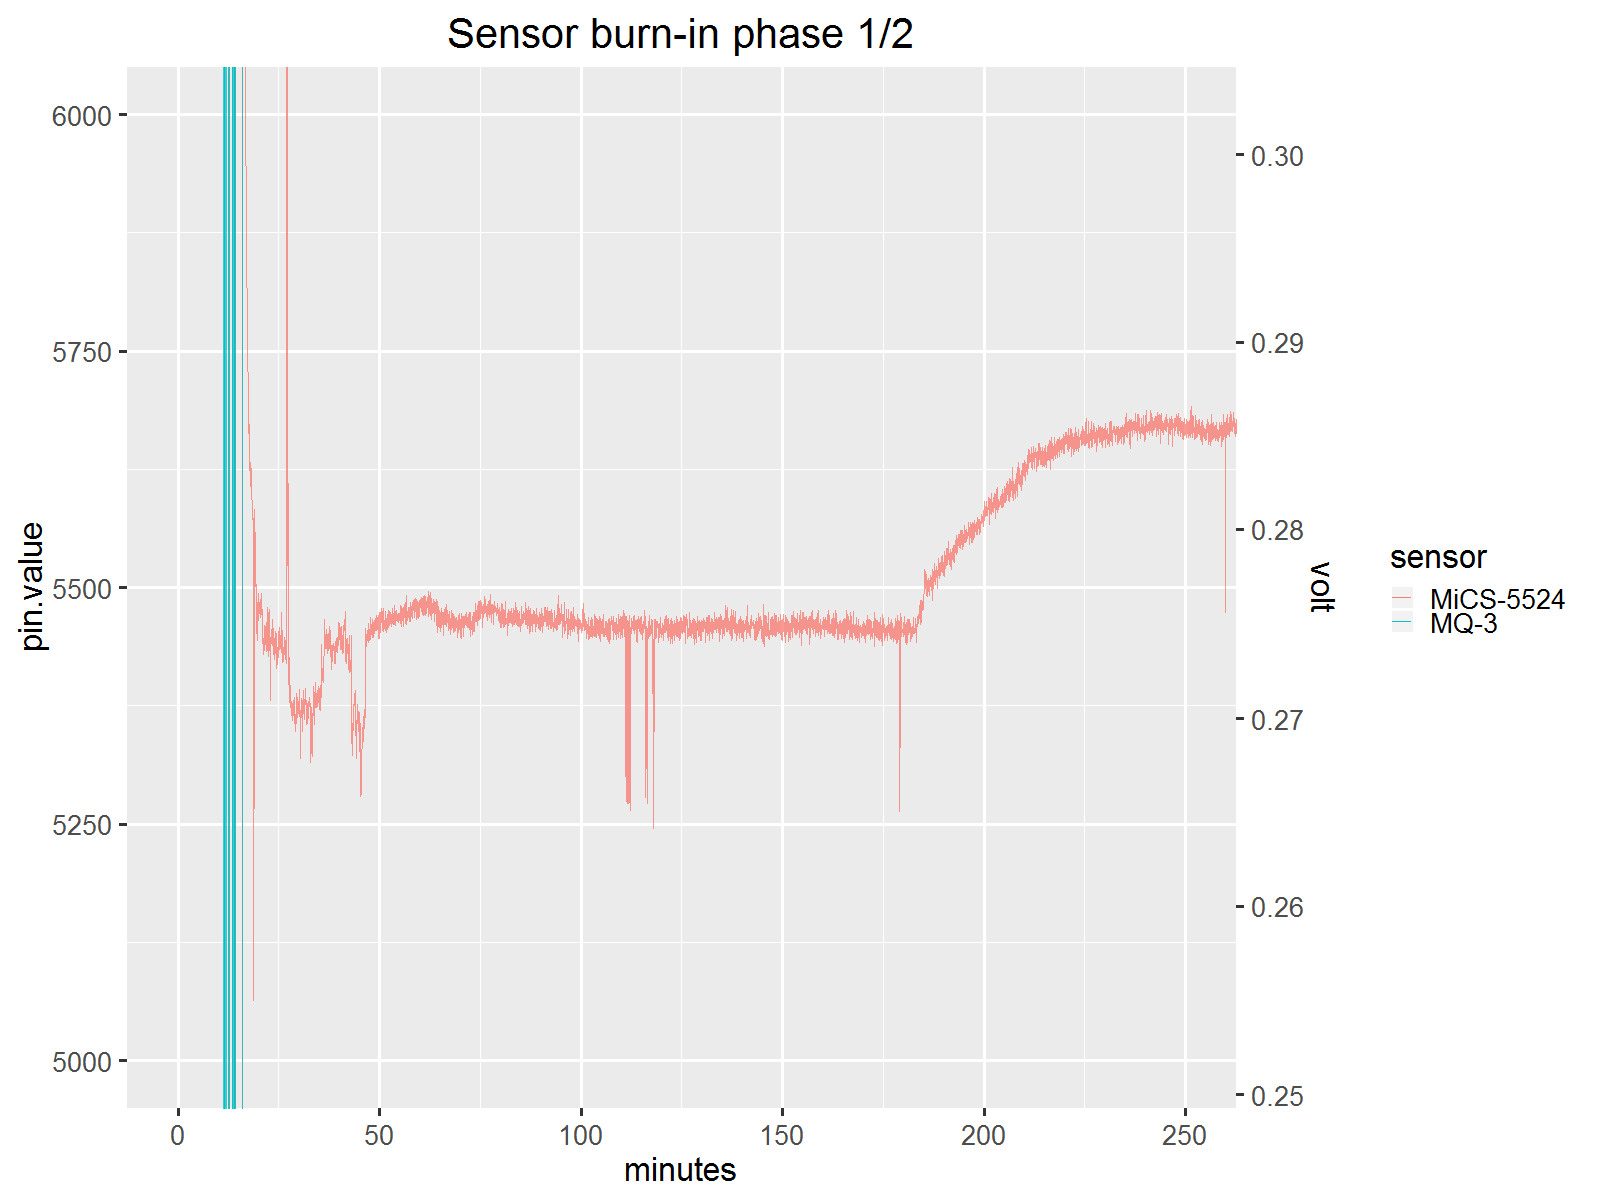 sensors_project1.sensorburnin.phase1.zoom3.png